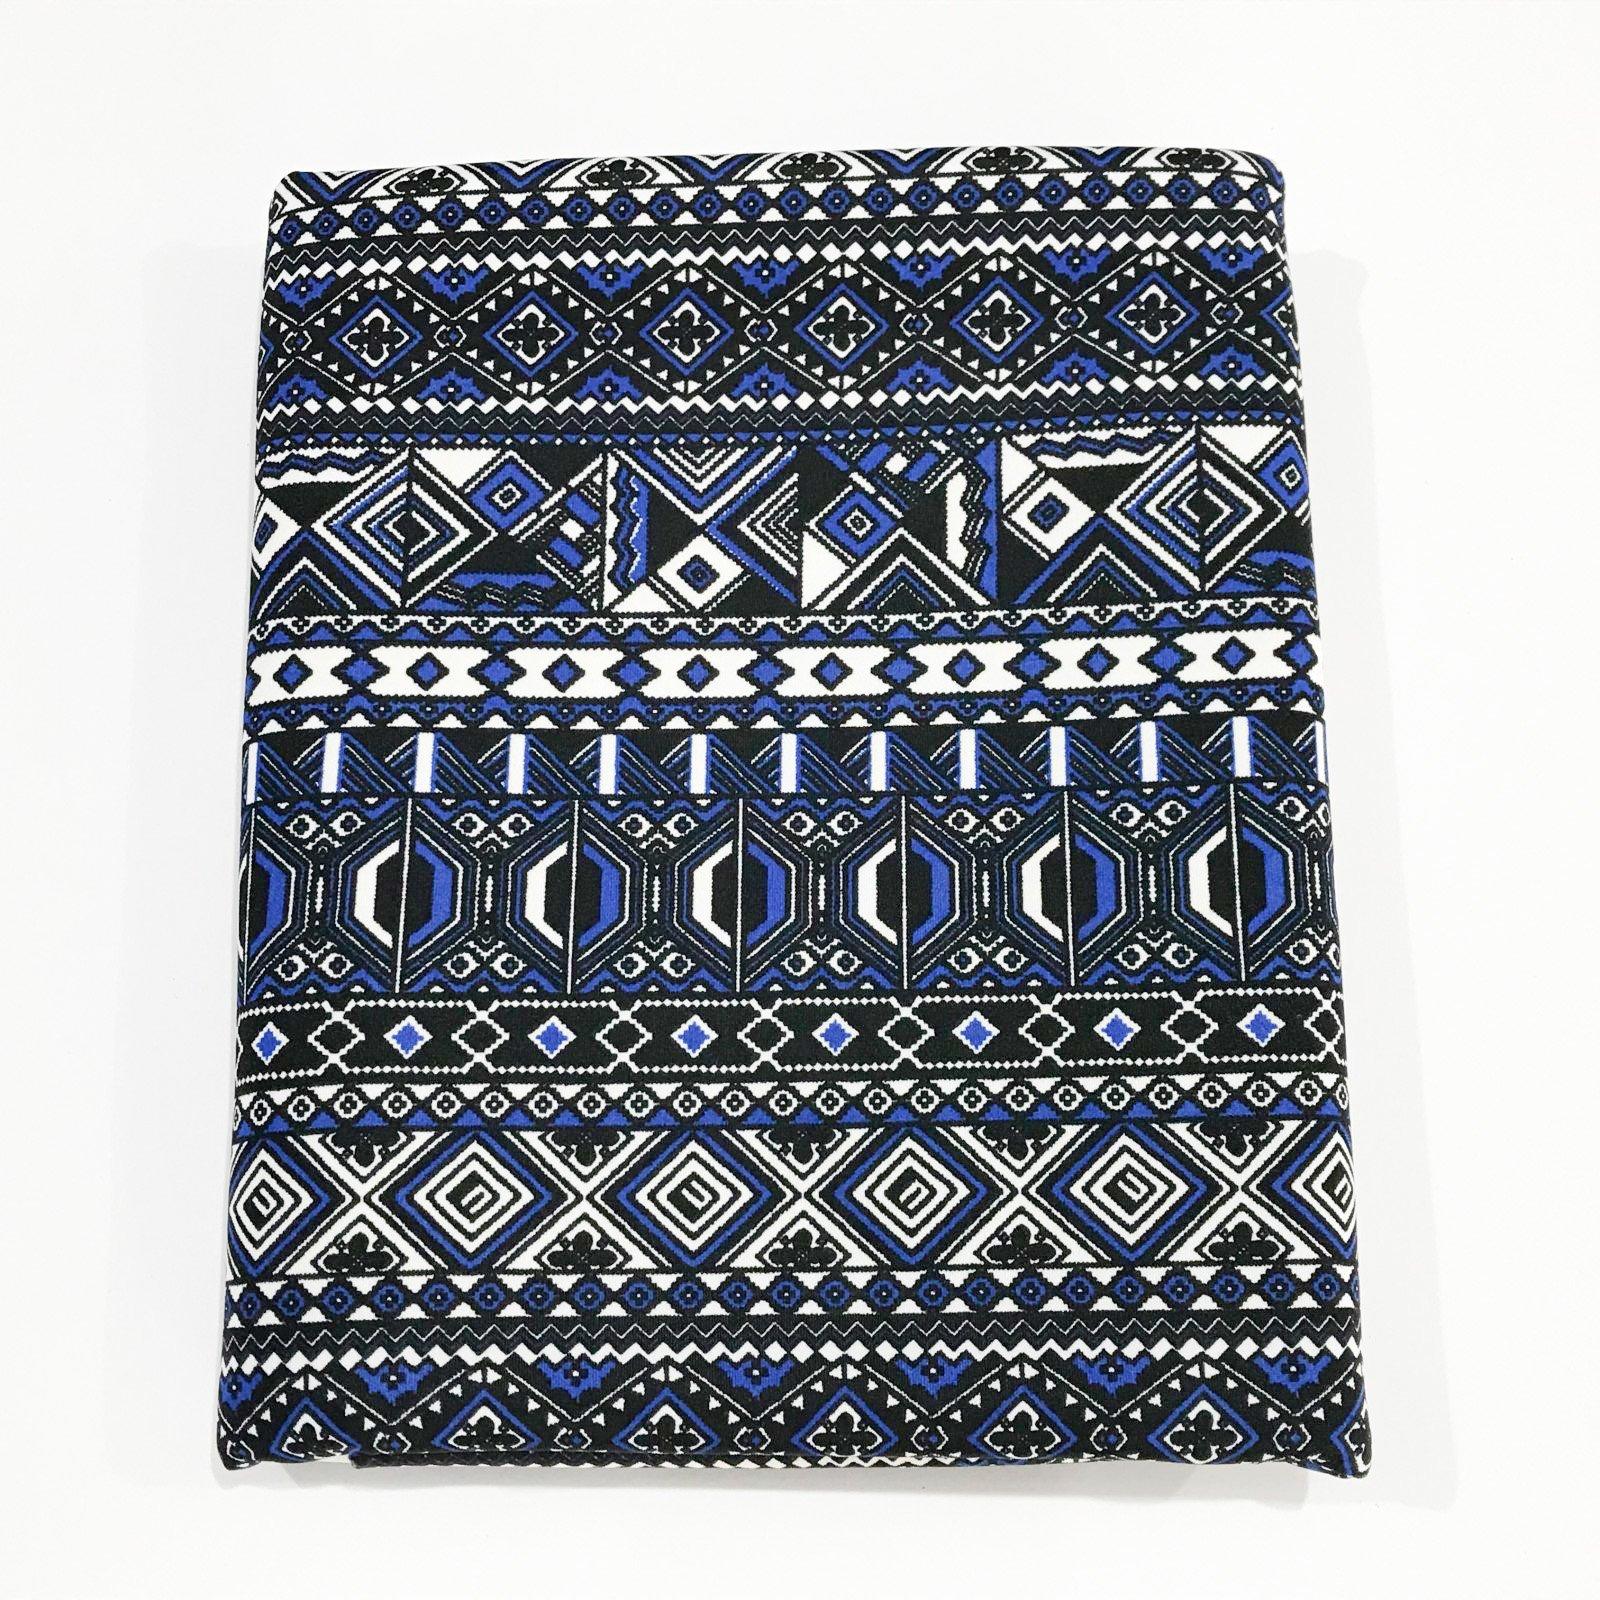 2 yard -  Ponte Knit - Mosaic Black and Blue